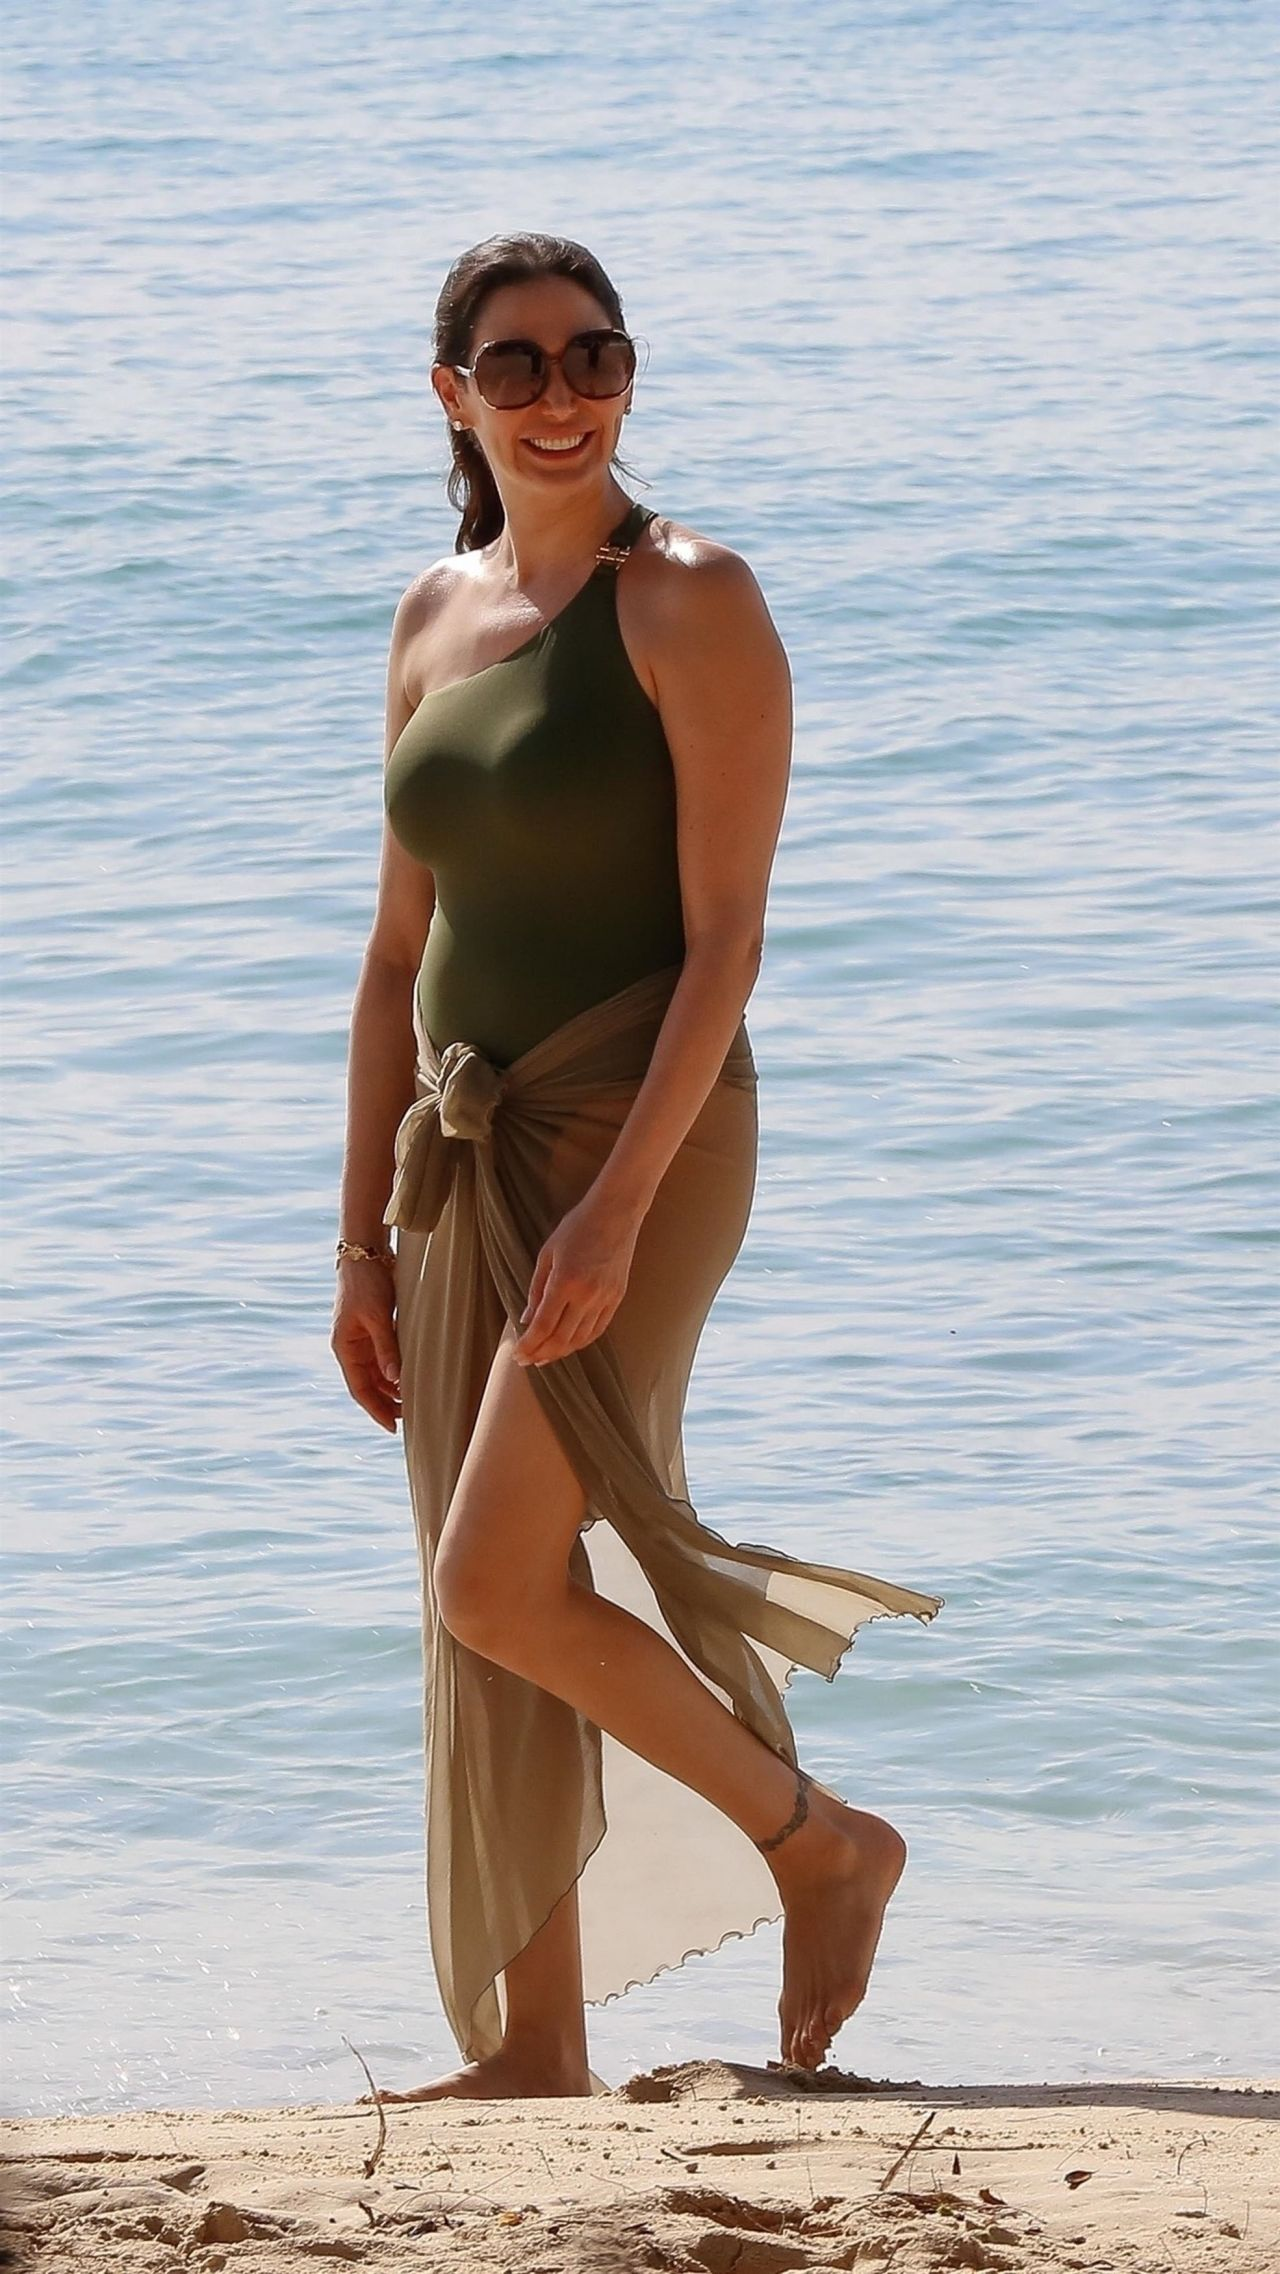 Hacked Swimsuit Lauren Silverman  nudes (12 images), Instagram, cleavage